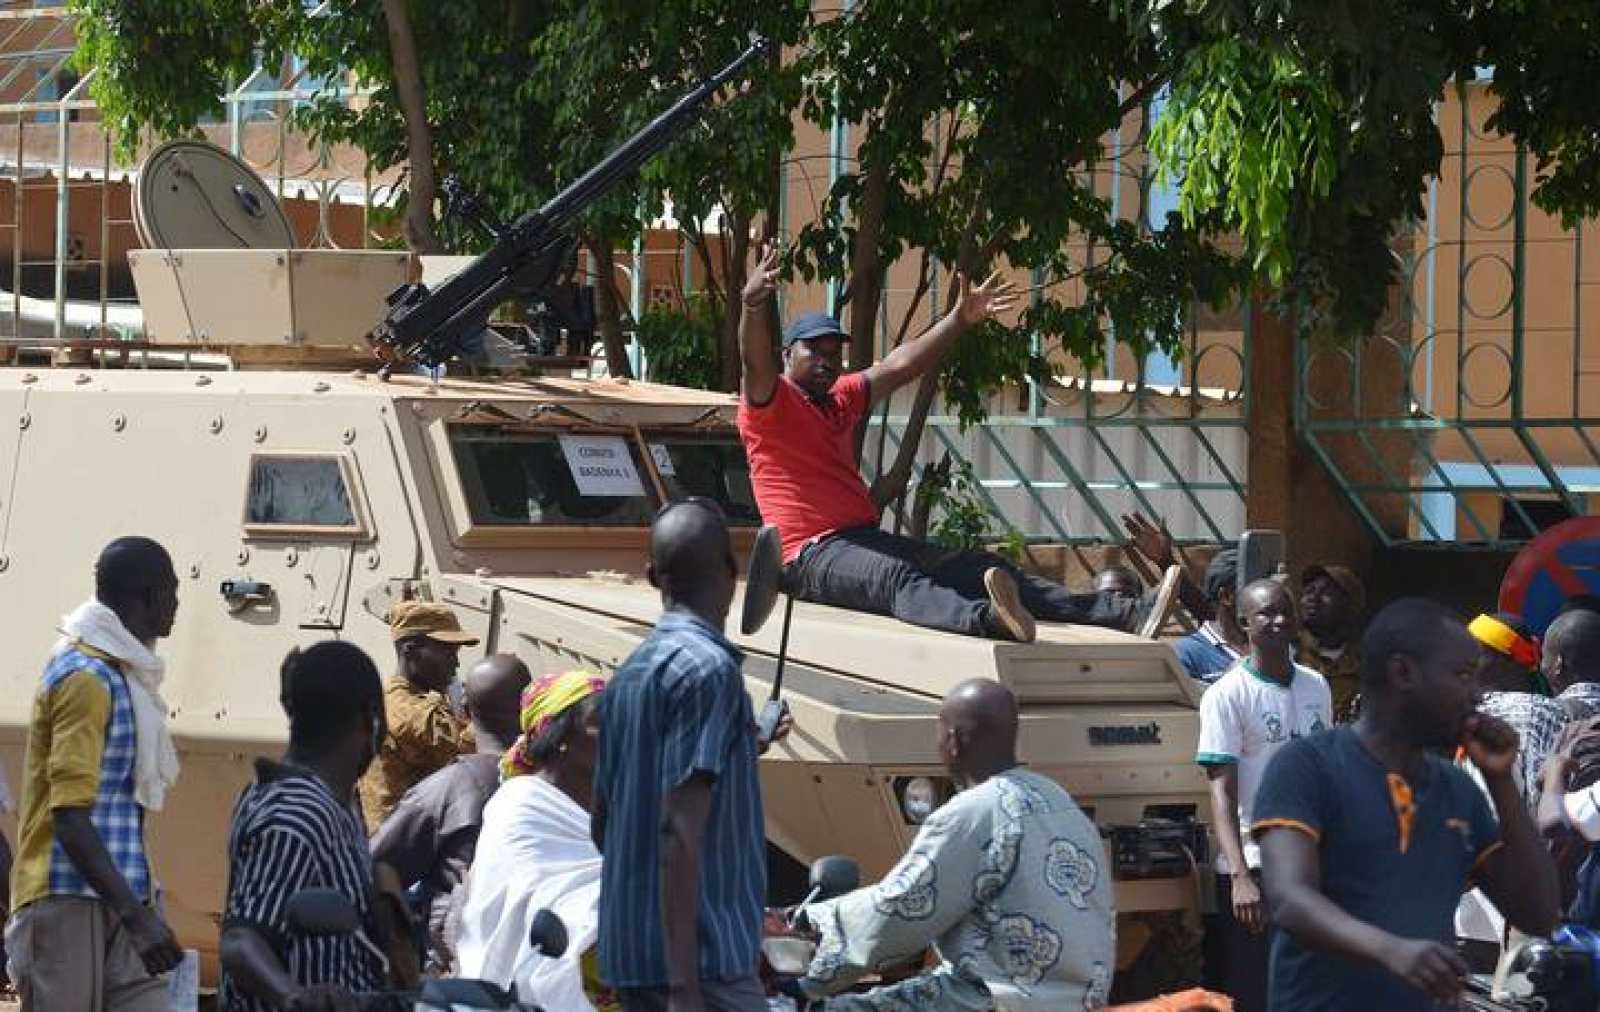 Un hombre celebra sobre un tanque la caída del presidente Blaise Compaoré.